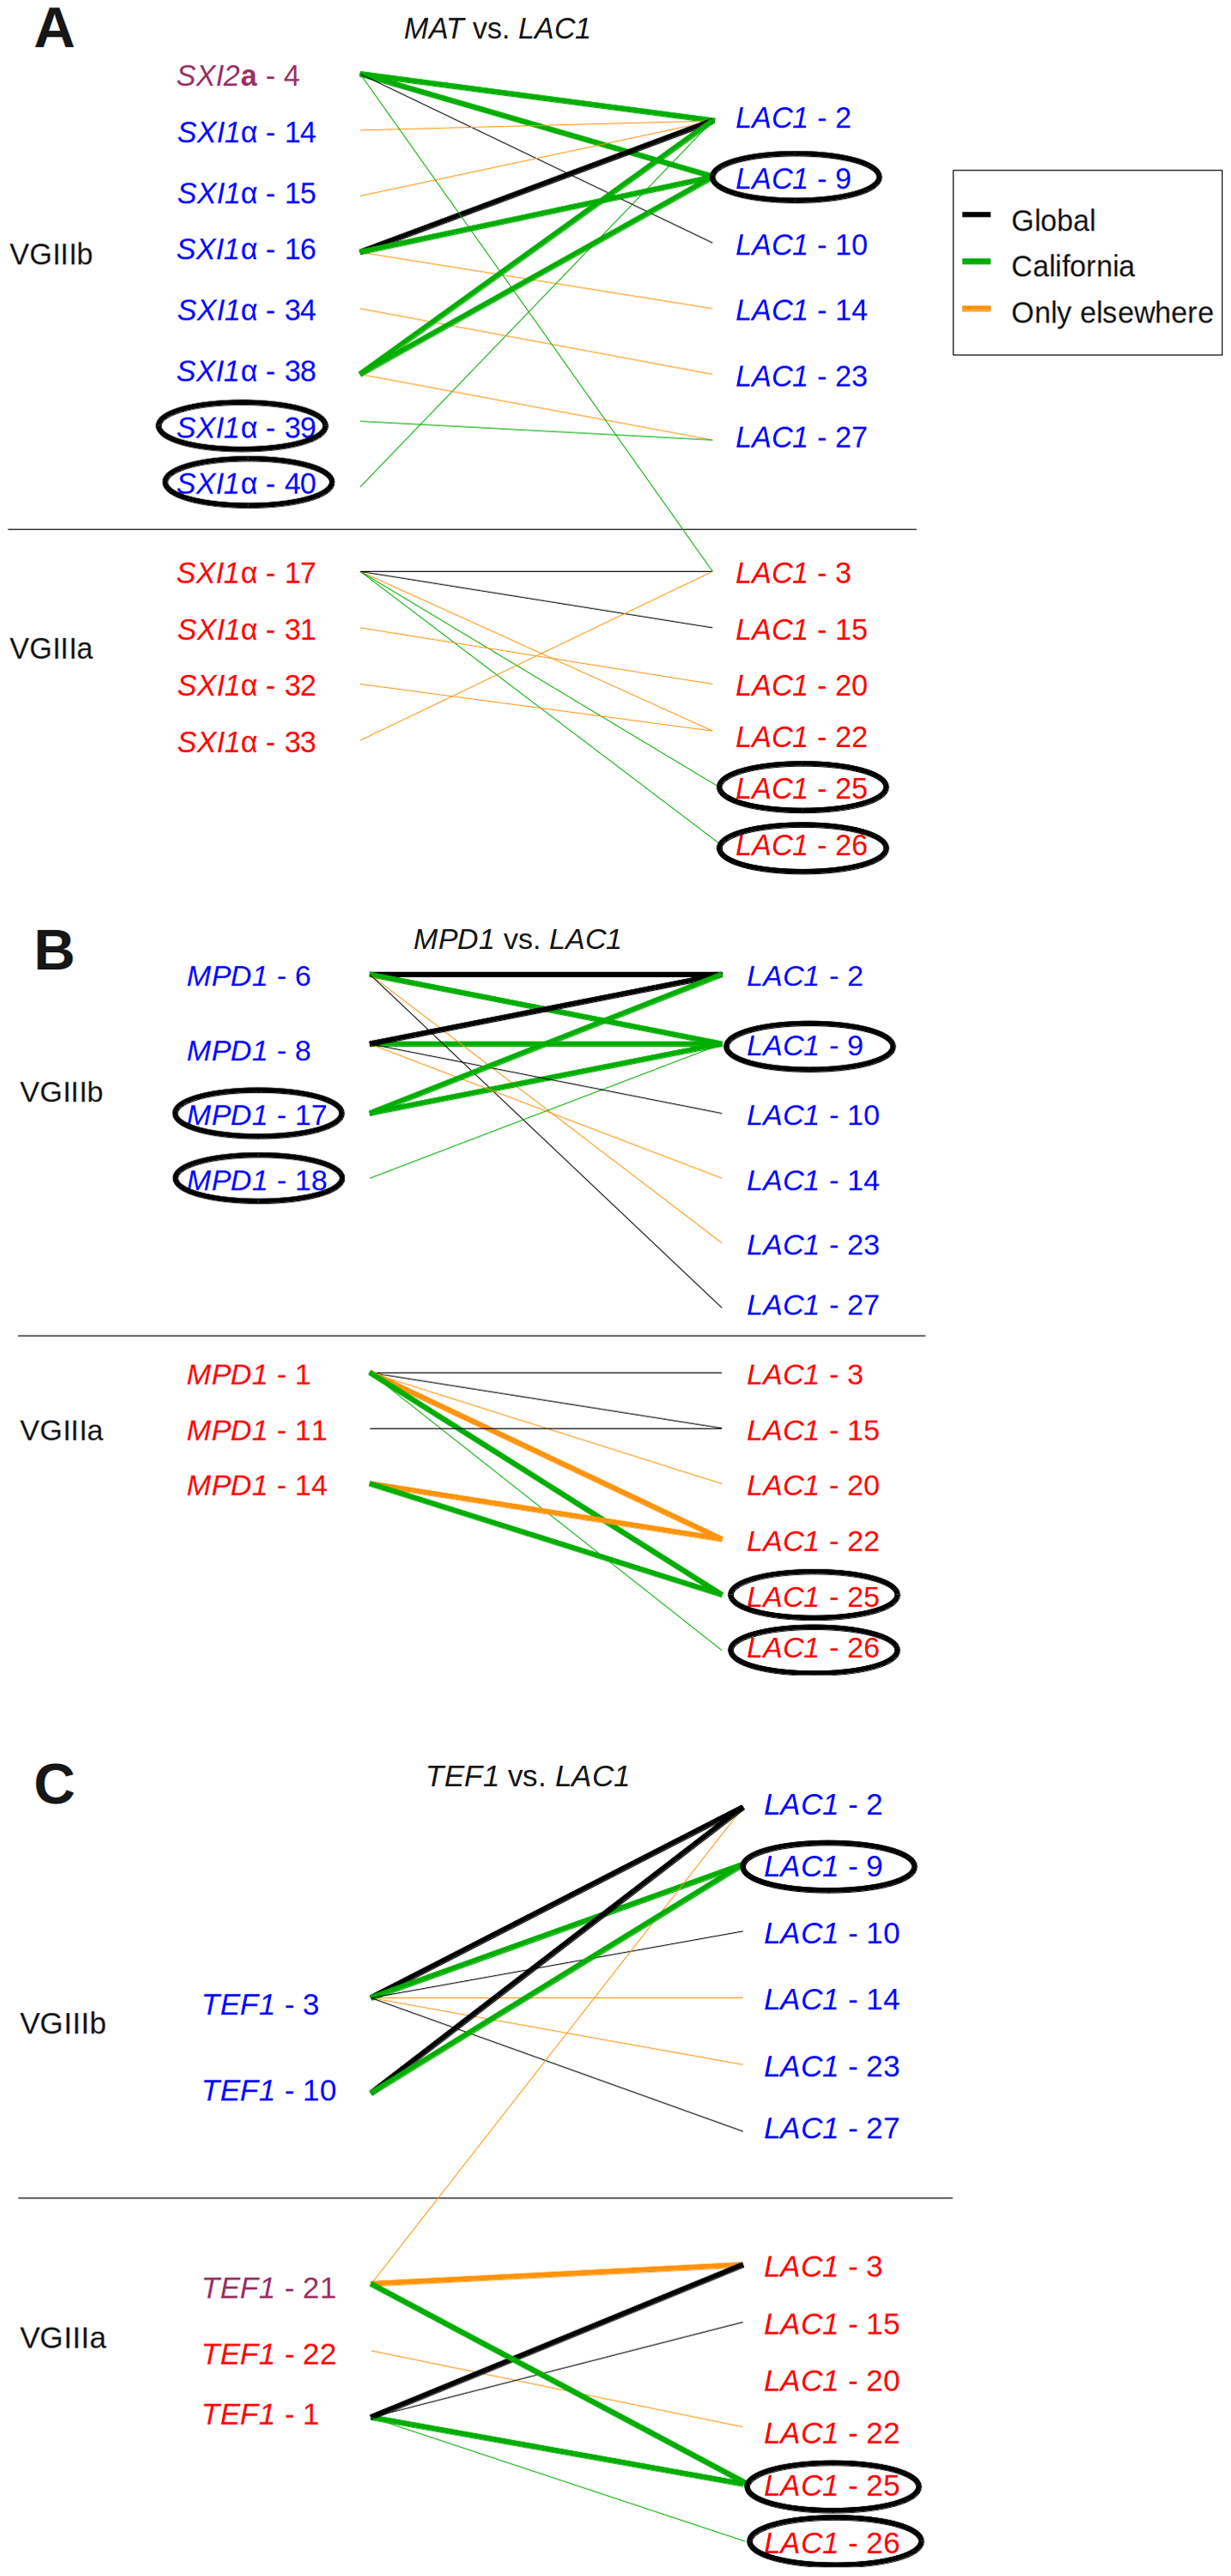 Evidence for recombination in Californian VGIII isolates.